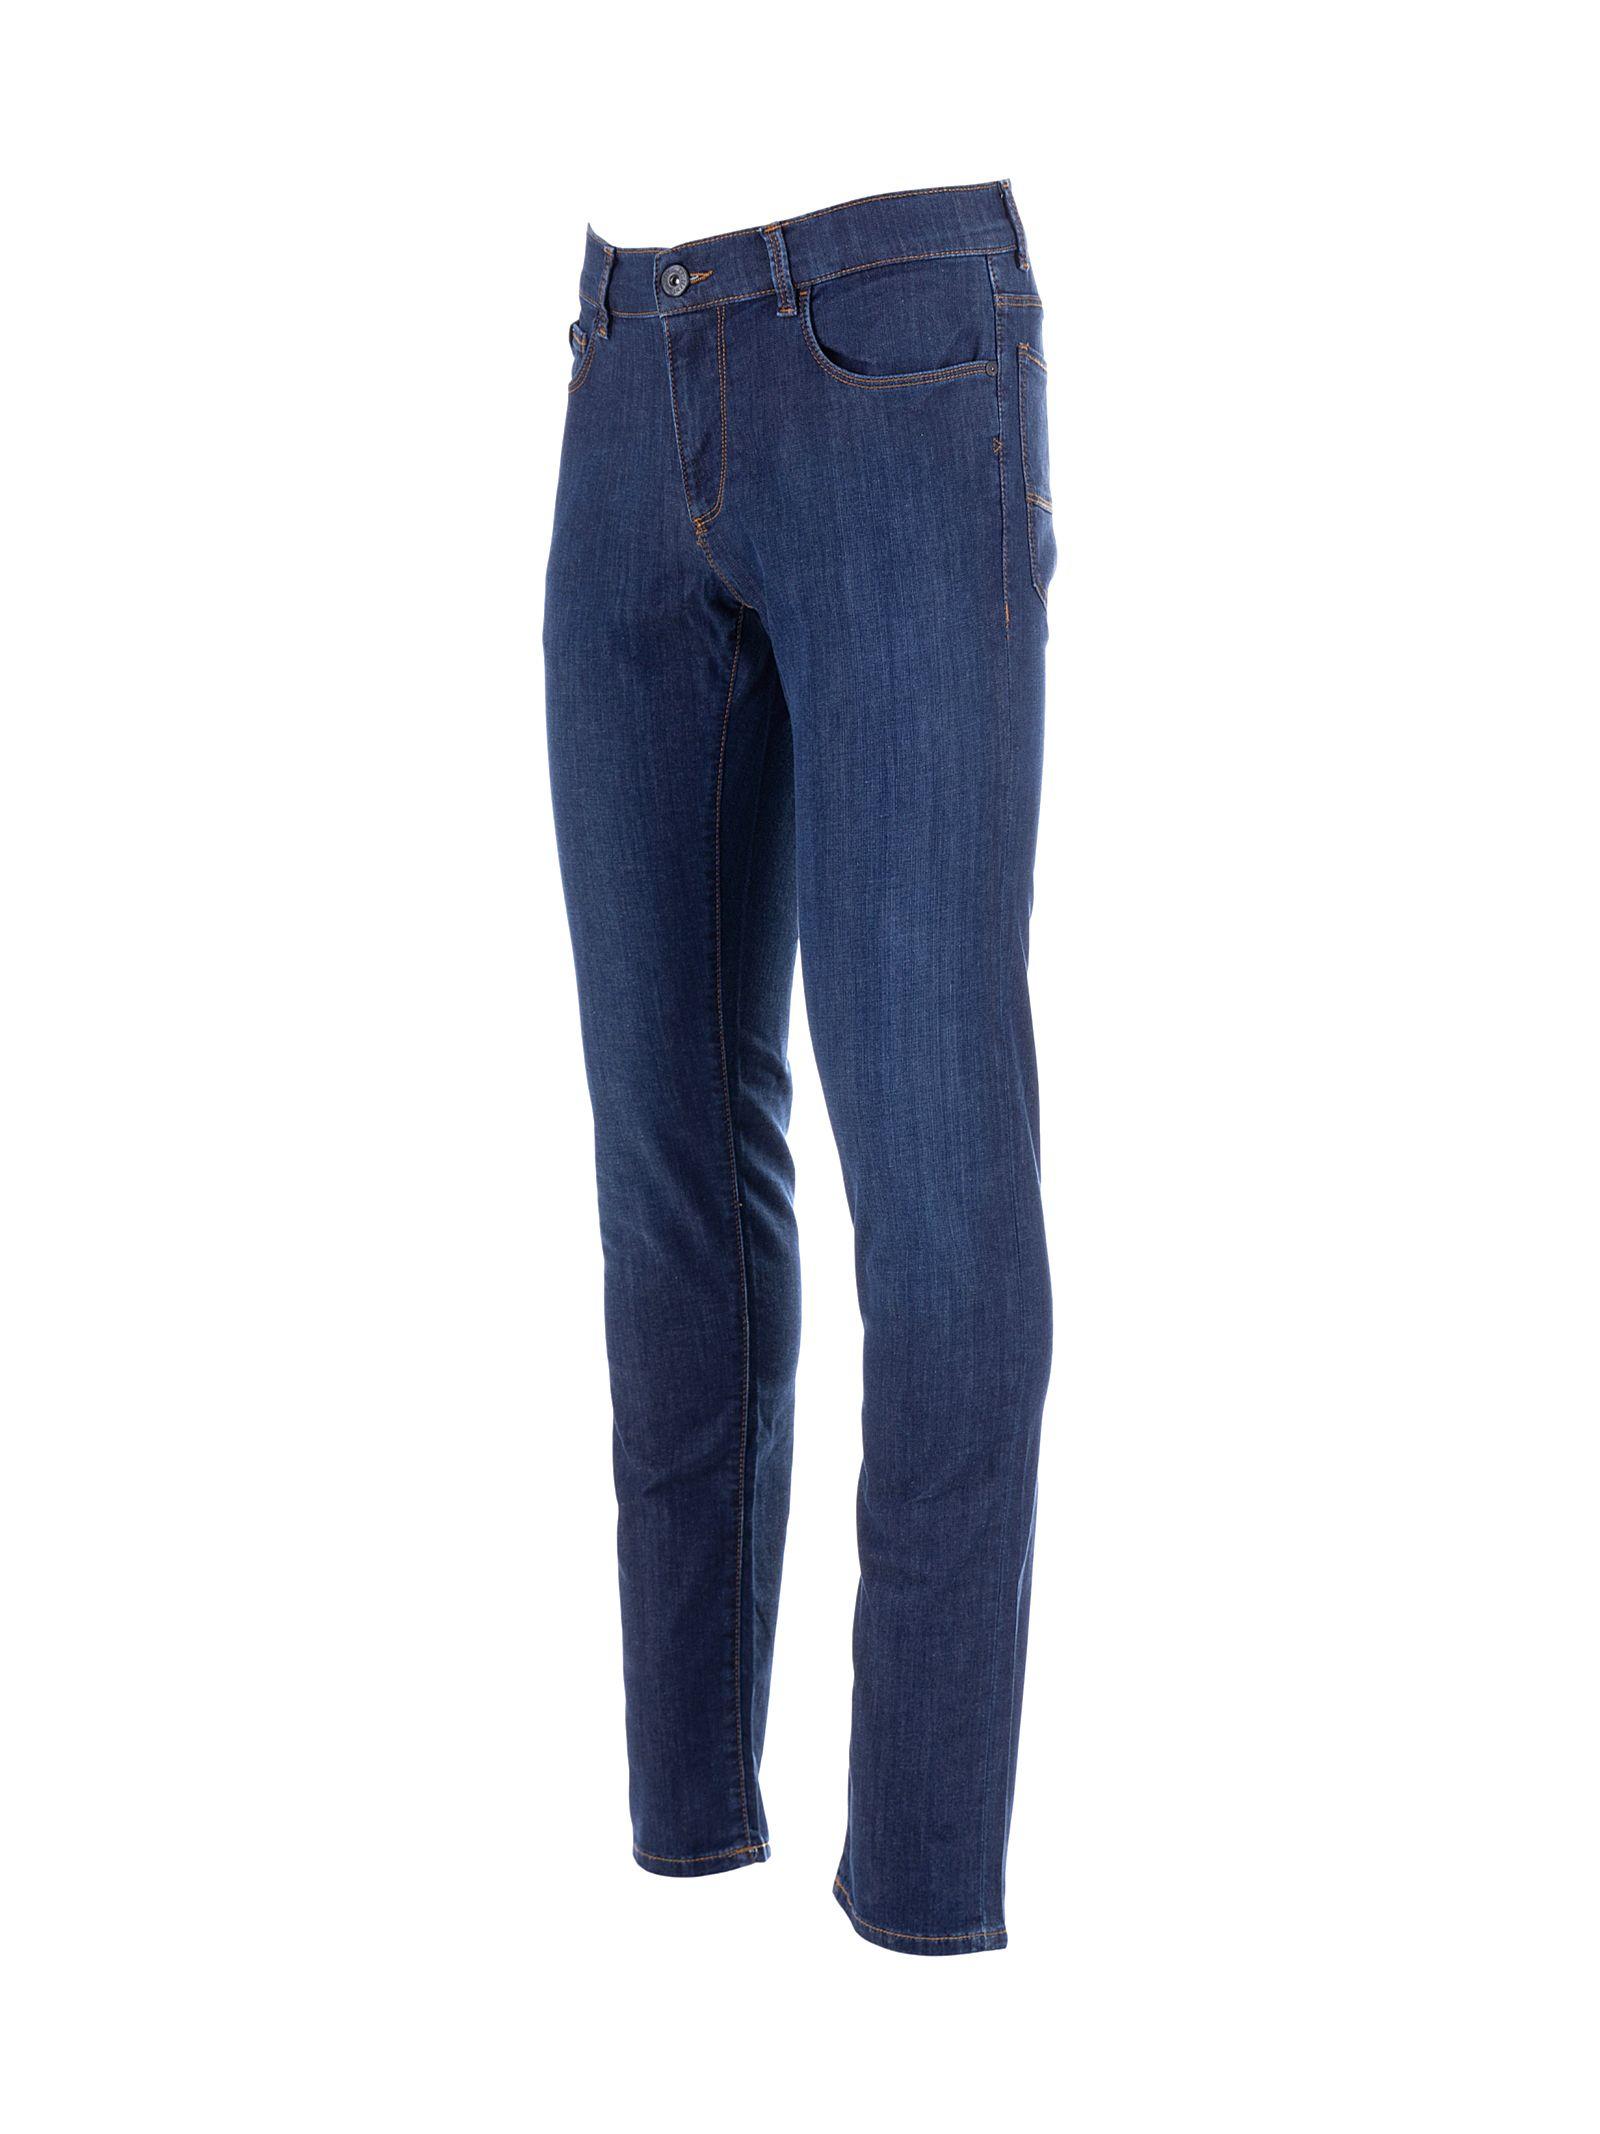 Trussardi Jeans 52J00000 1Y000149